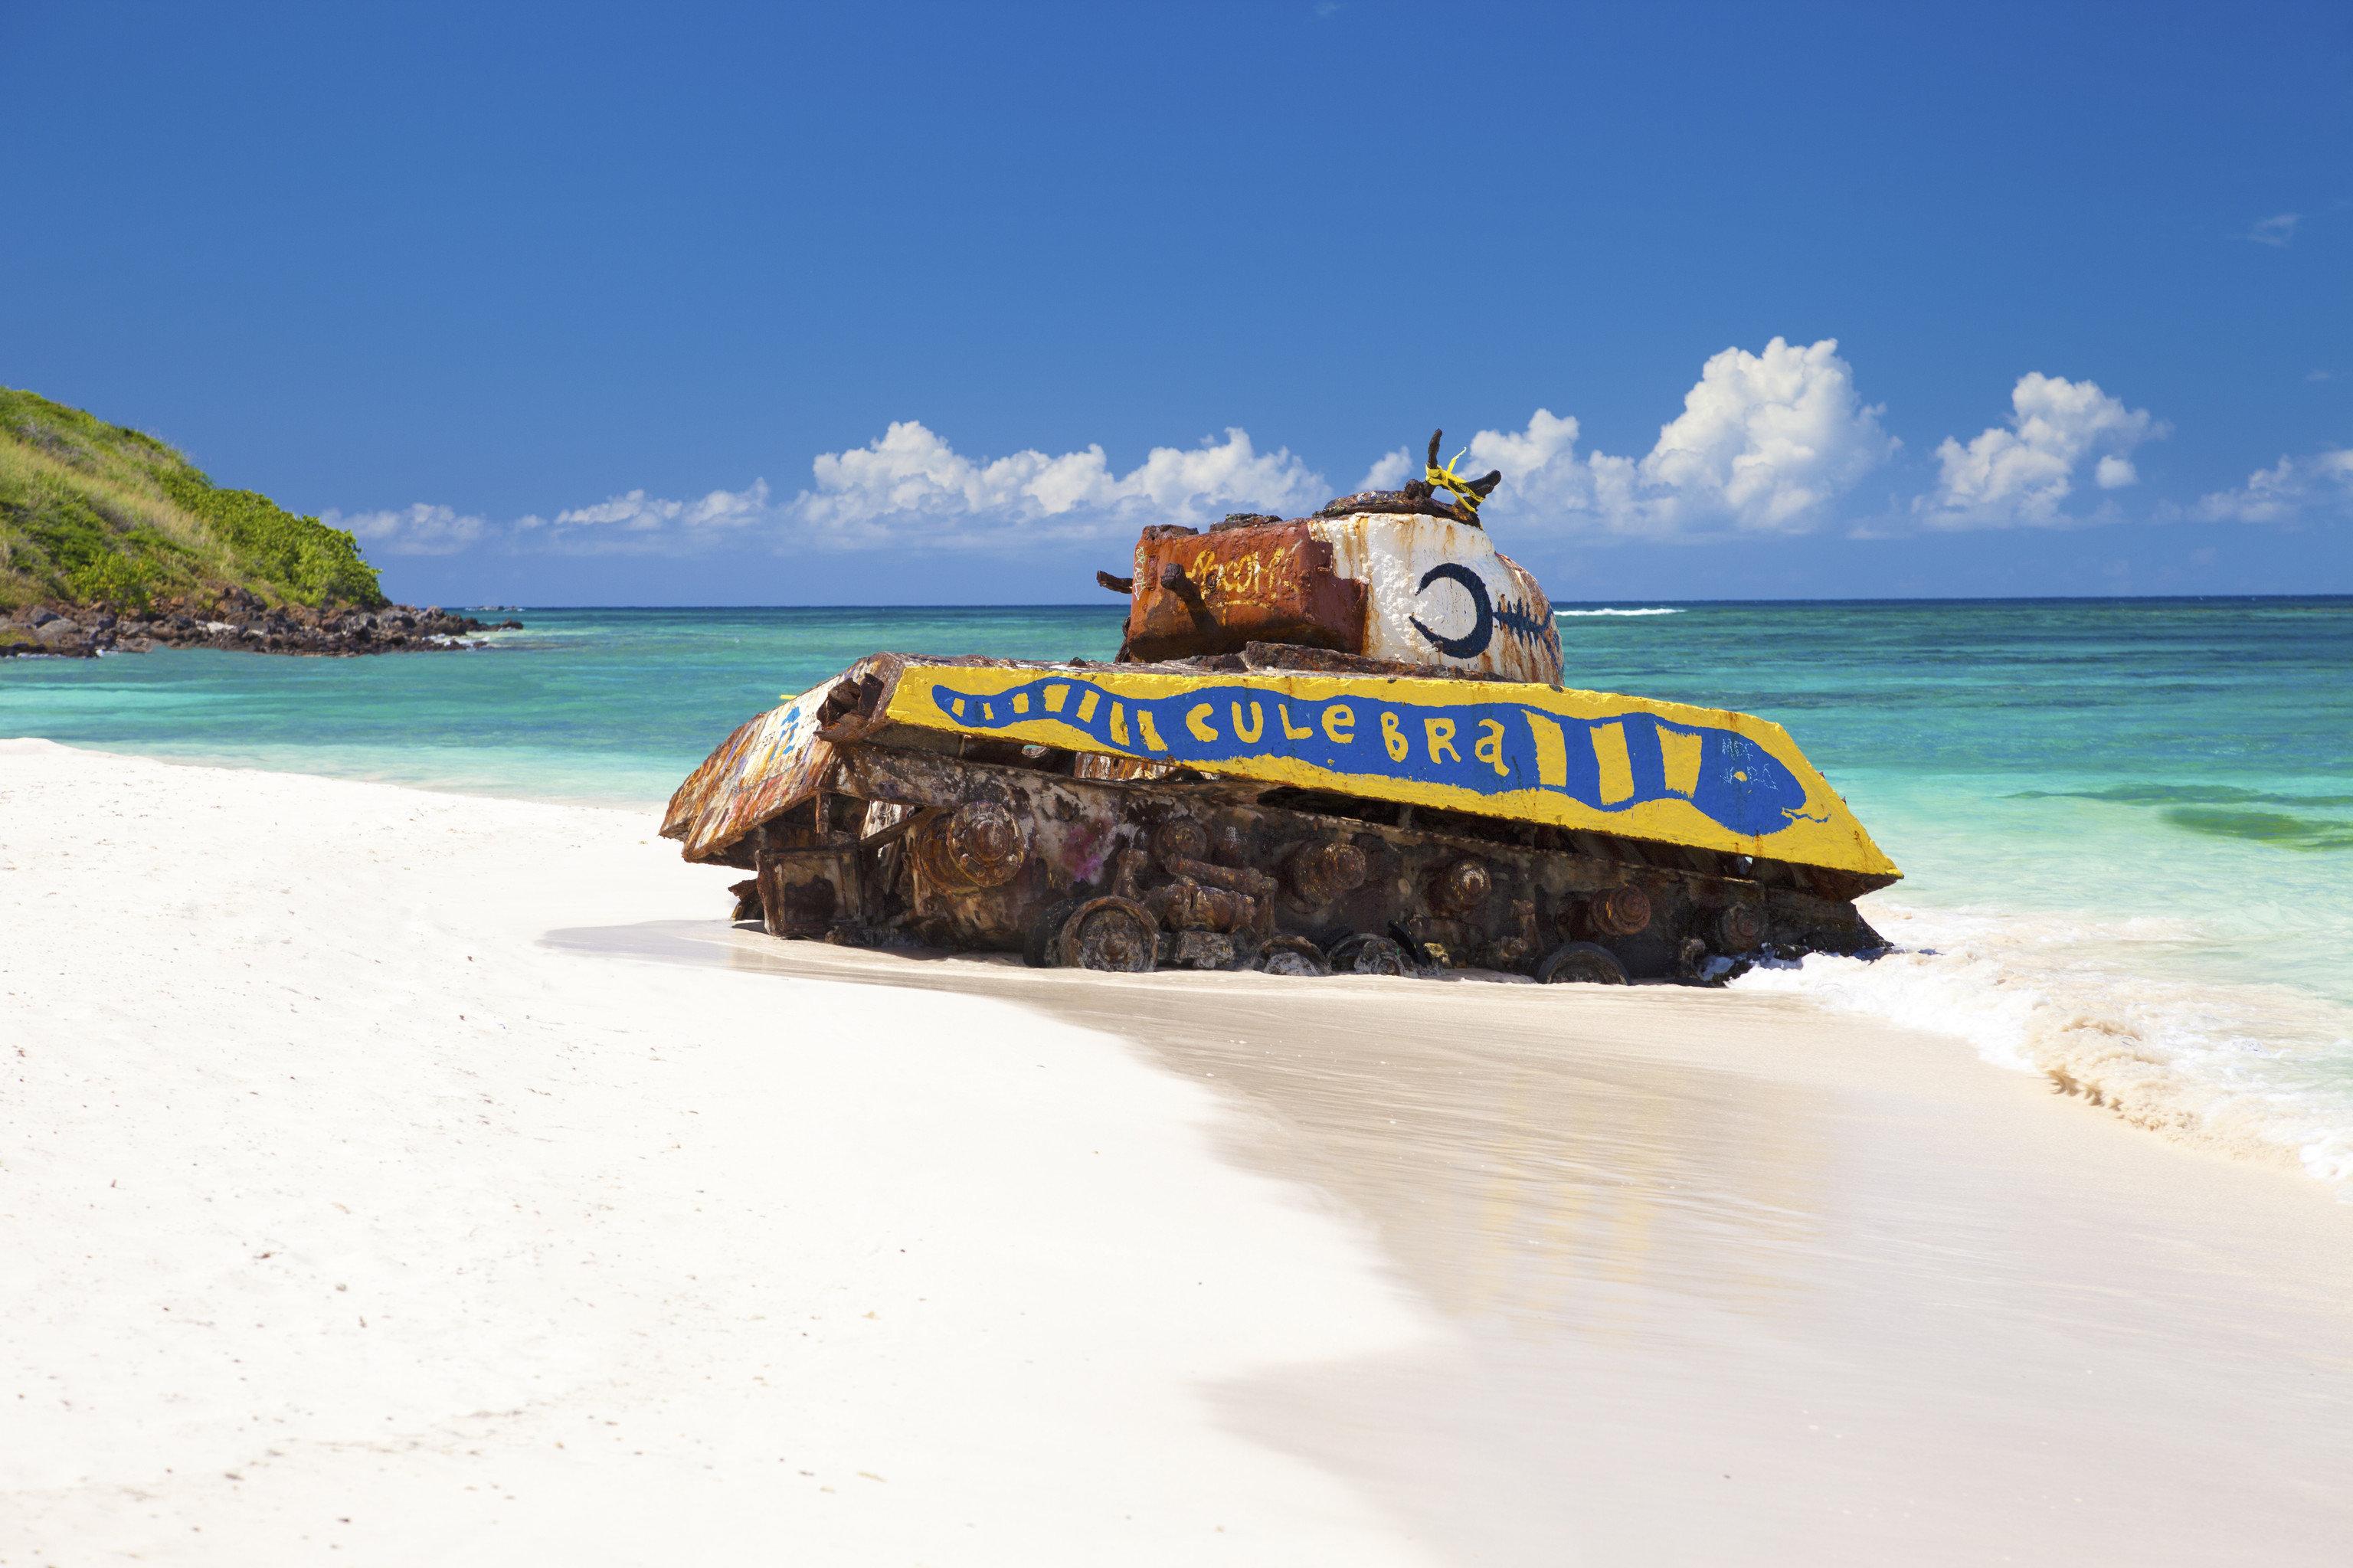 Secret Getaways Trip Ideas coastal and oceanic landforms Beach Sea shore vacation Coast Ocean caribbean sky sand water vehicle tourism